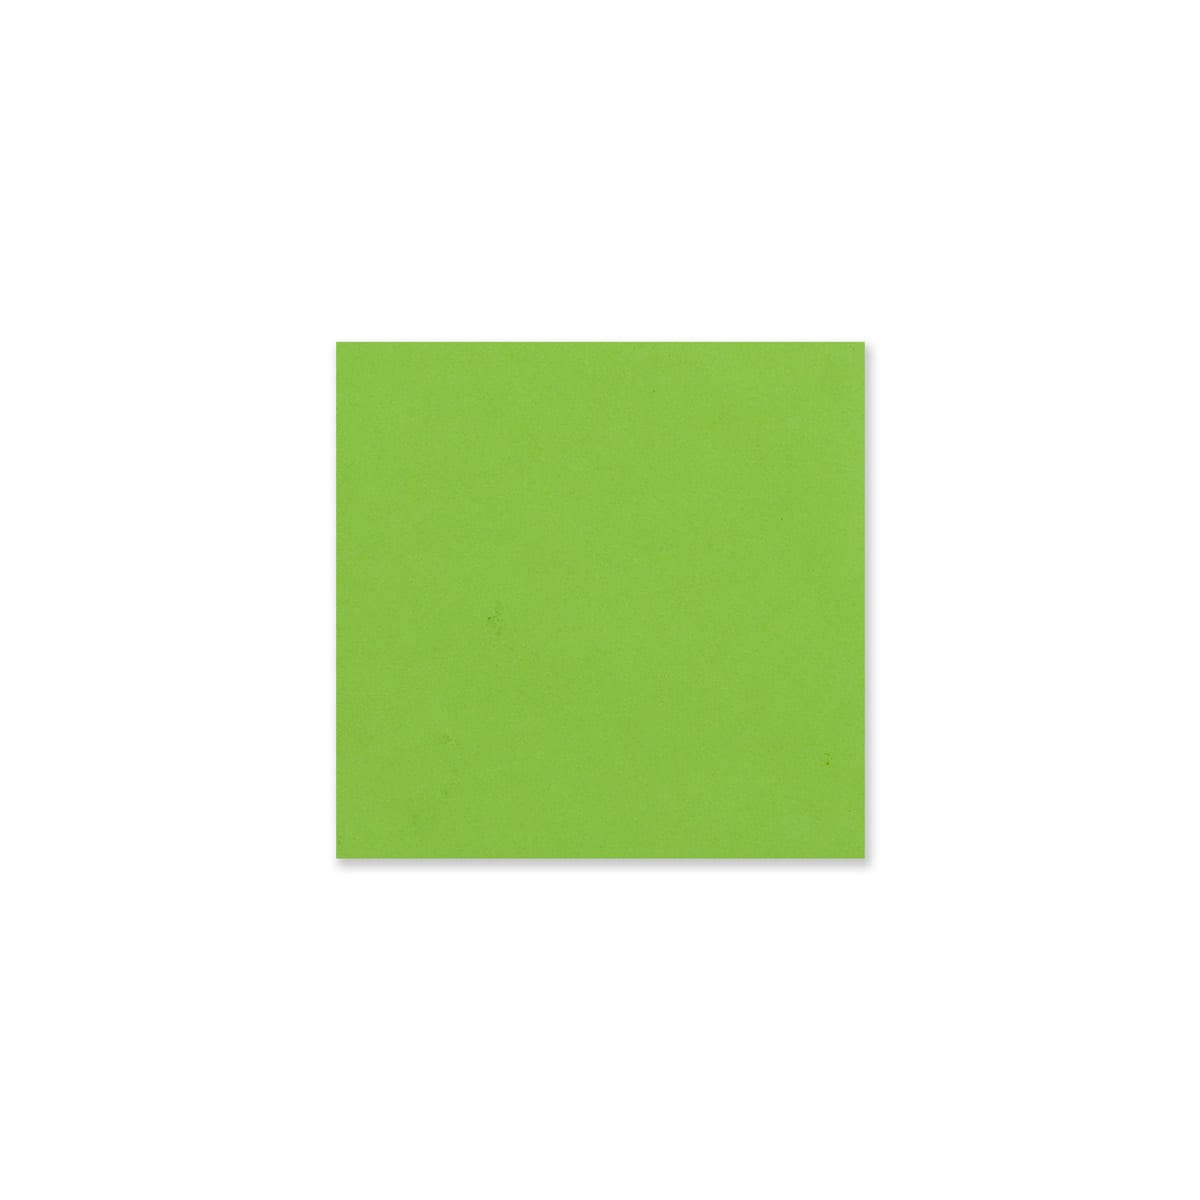 110 x 110mm MID GREEN ENVELOPES